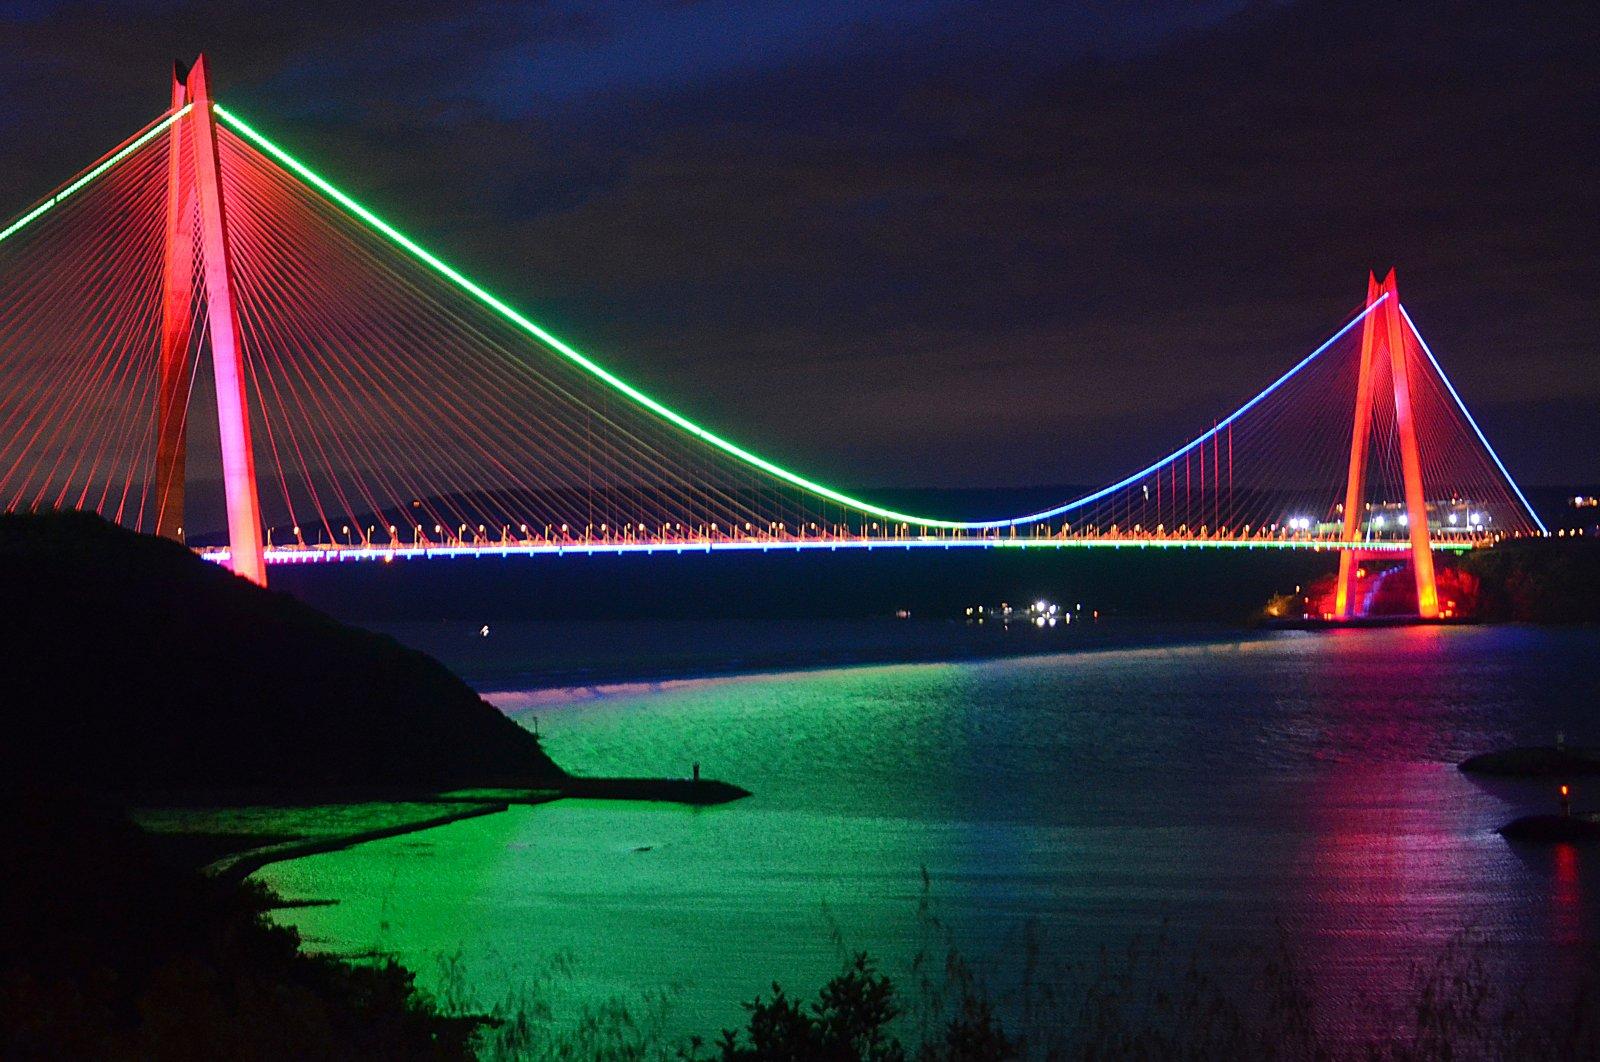 Istanbul's Yavuz Sultan Selim Bridge lit in colors of the Azerbaijani flag on May 28, 2020 (AA Photo)